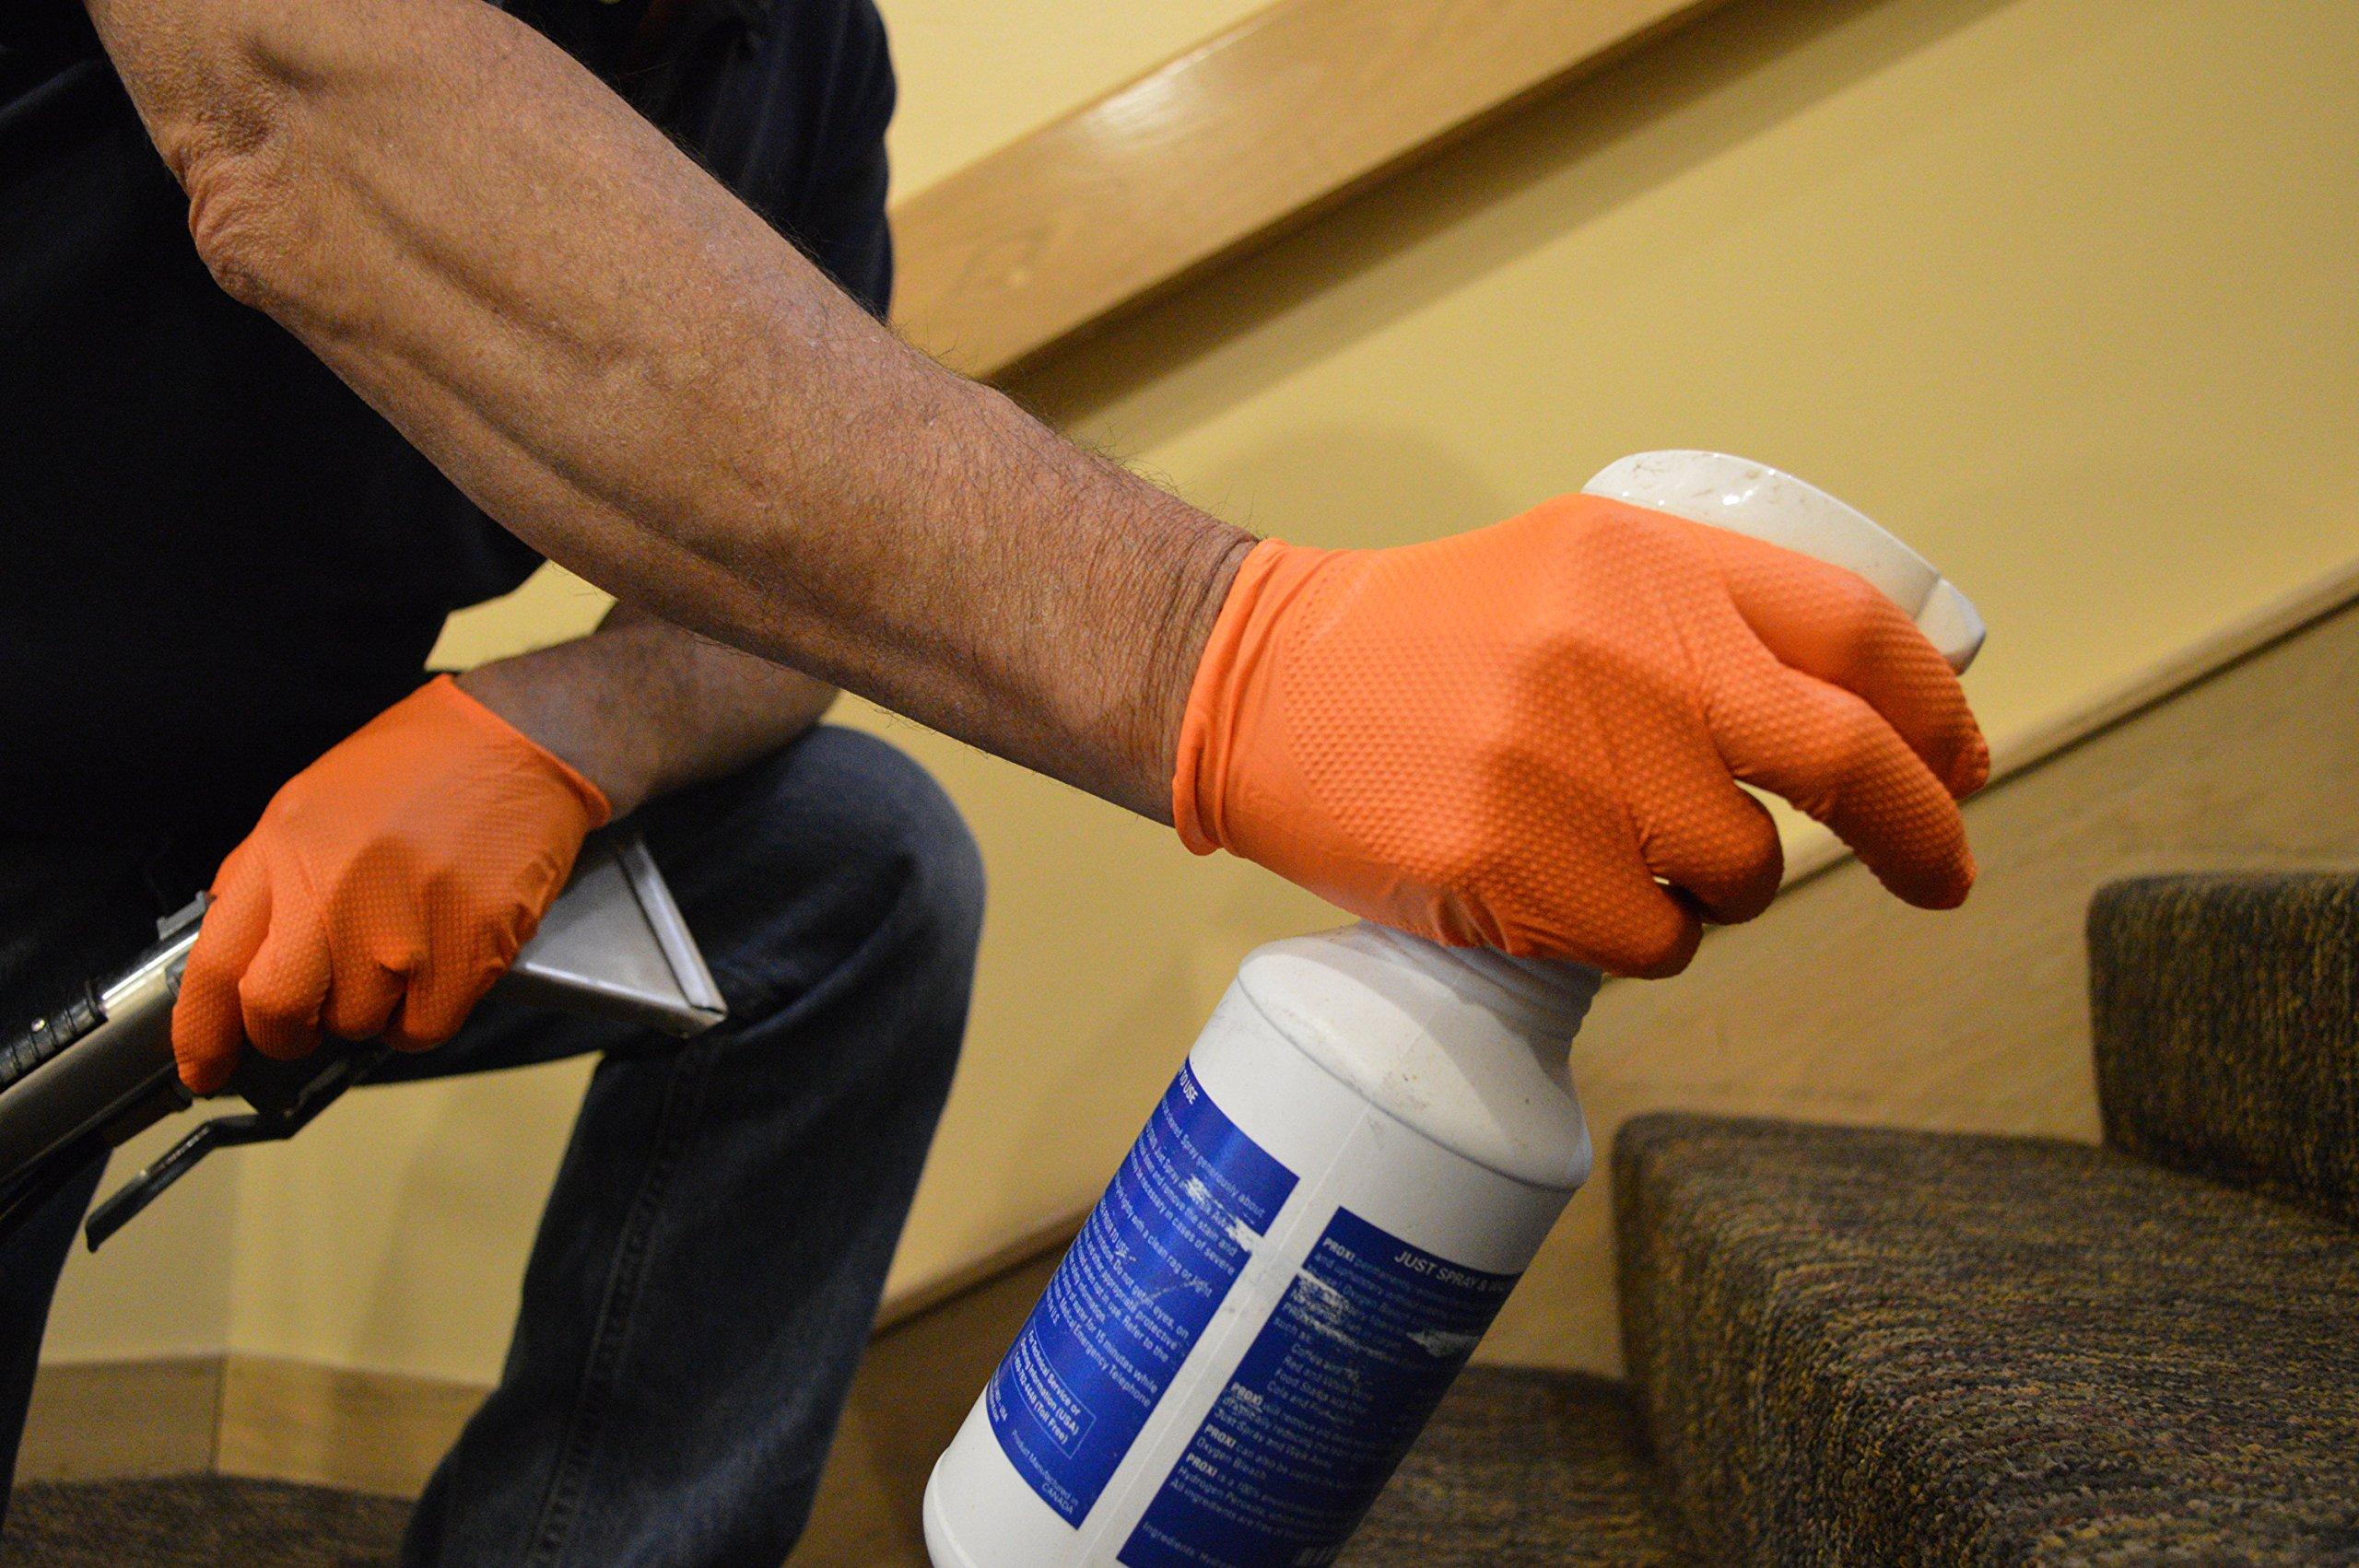 SupplyMaster - SMDTON8M - Diamond Texture Nitrile Gloves - Disposable, Powder Free, Industrial, 8 mil, Medium, Orange (Case of 200) by SupplyMaster (Image #9)